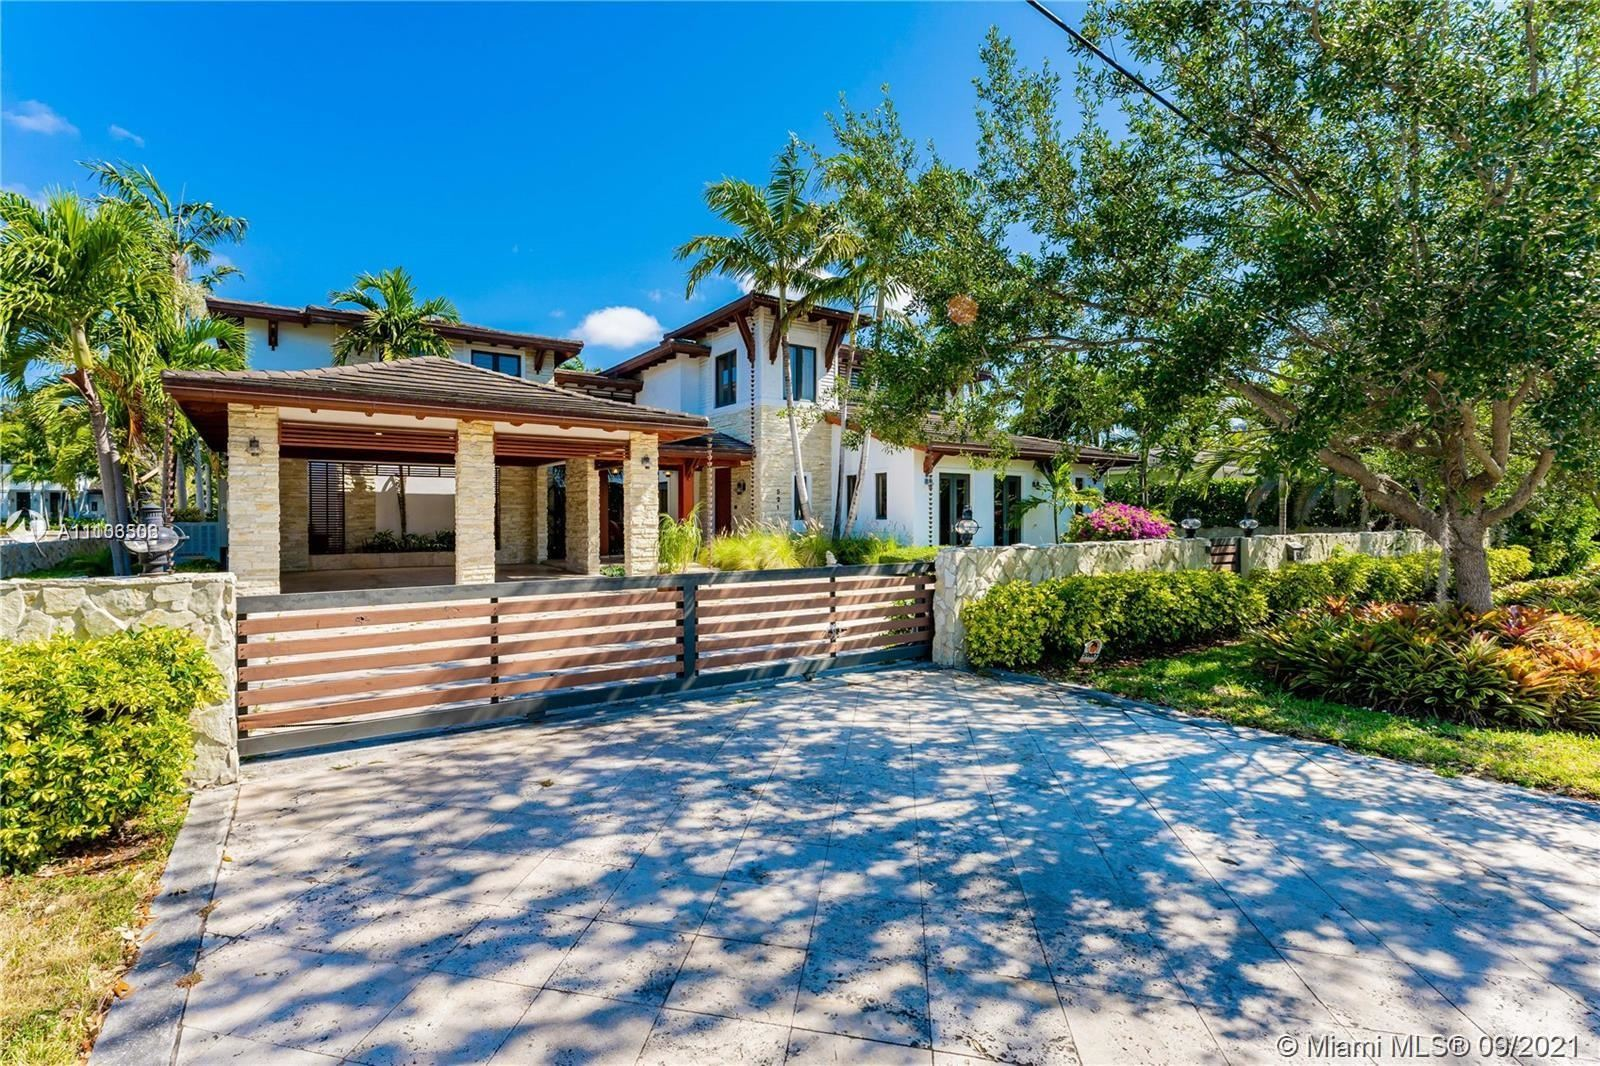 521 Vilabella Ave, Coral Gables, FL 33146 - #: A11103506